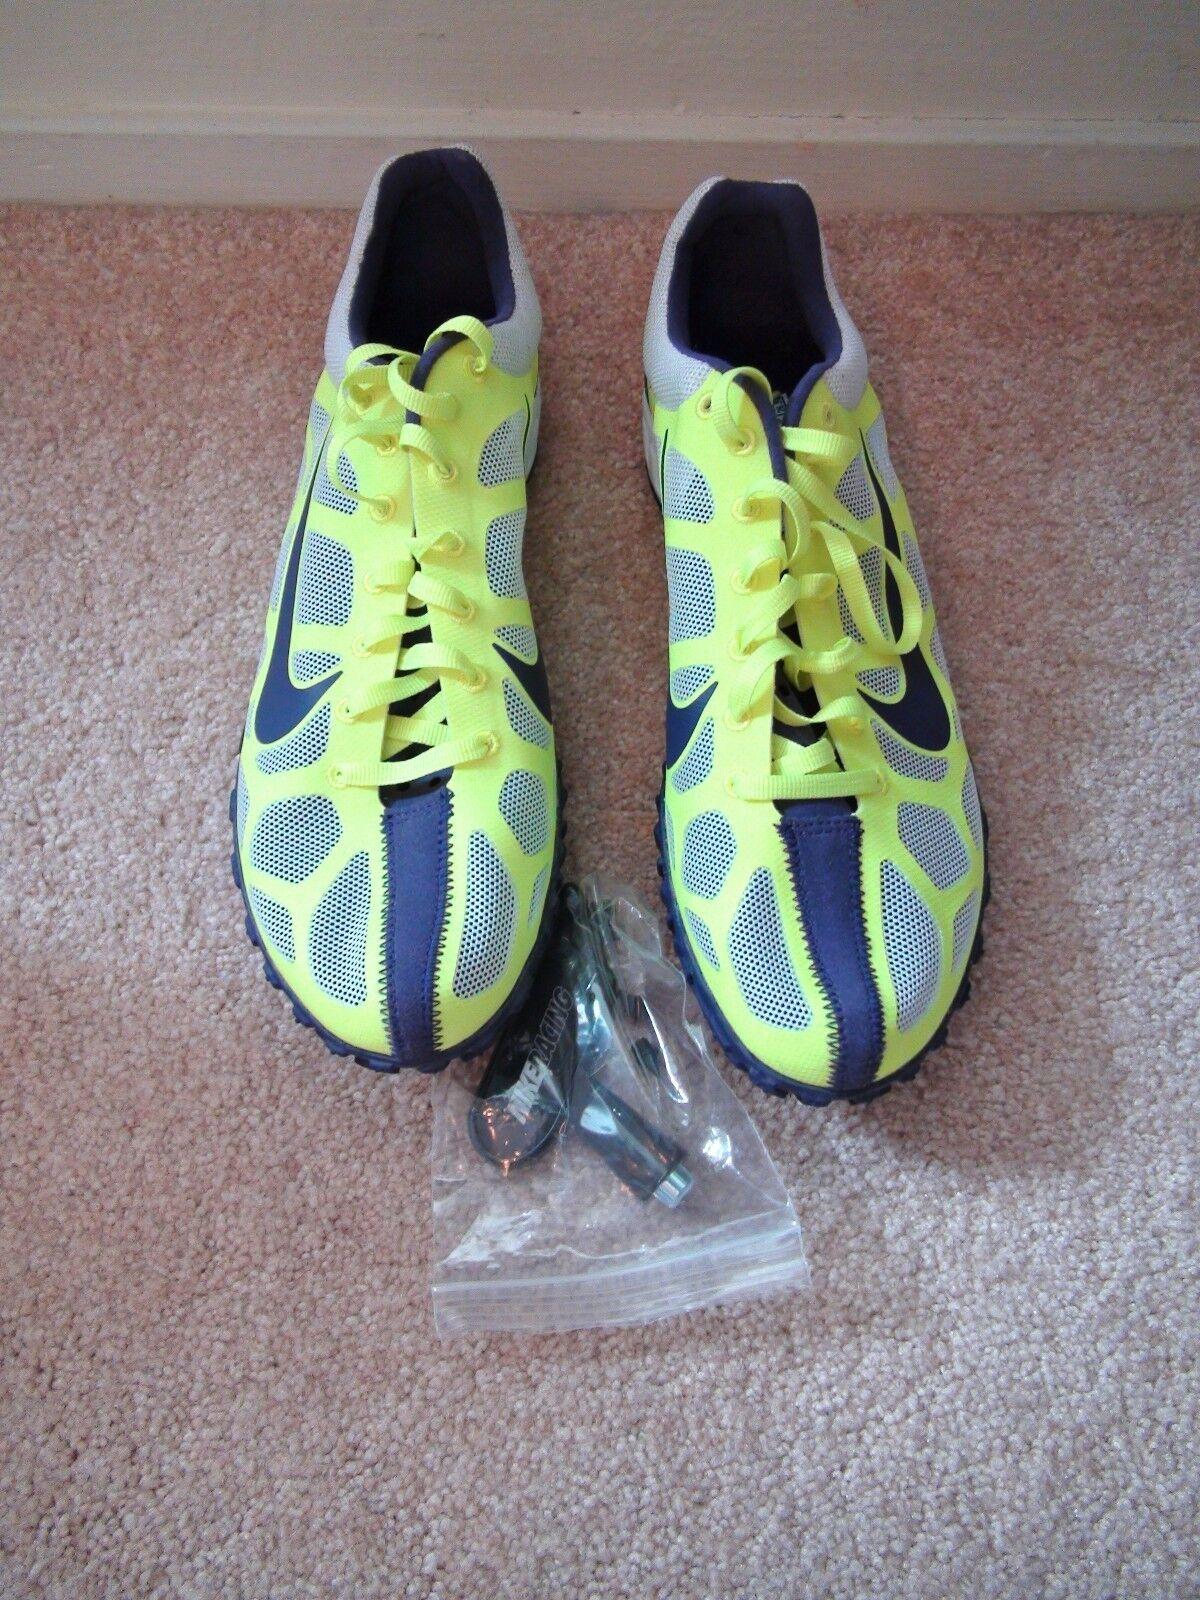 Nike Zoom Waffle XC VIII Cross Country Spike Track Shoe 407060-100 Men's 8.5 NEW